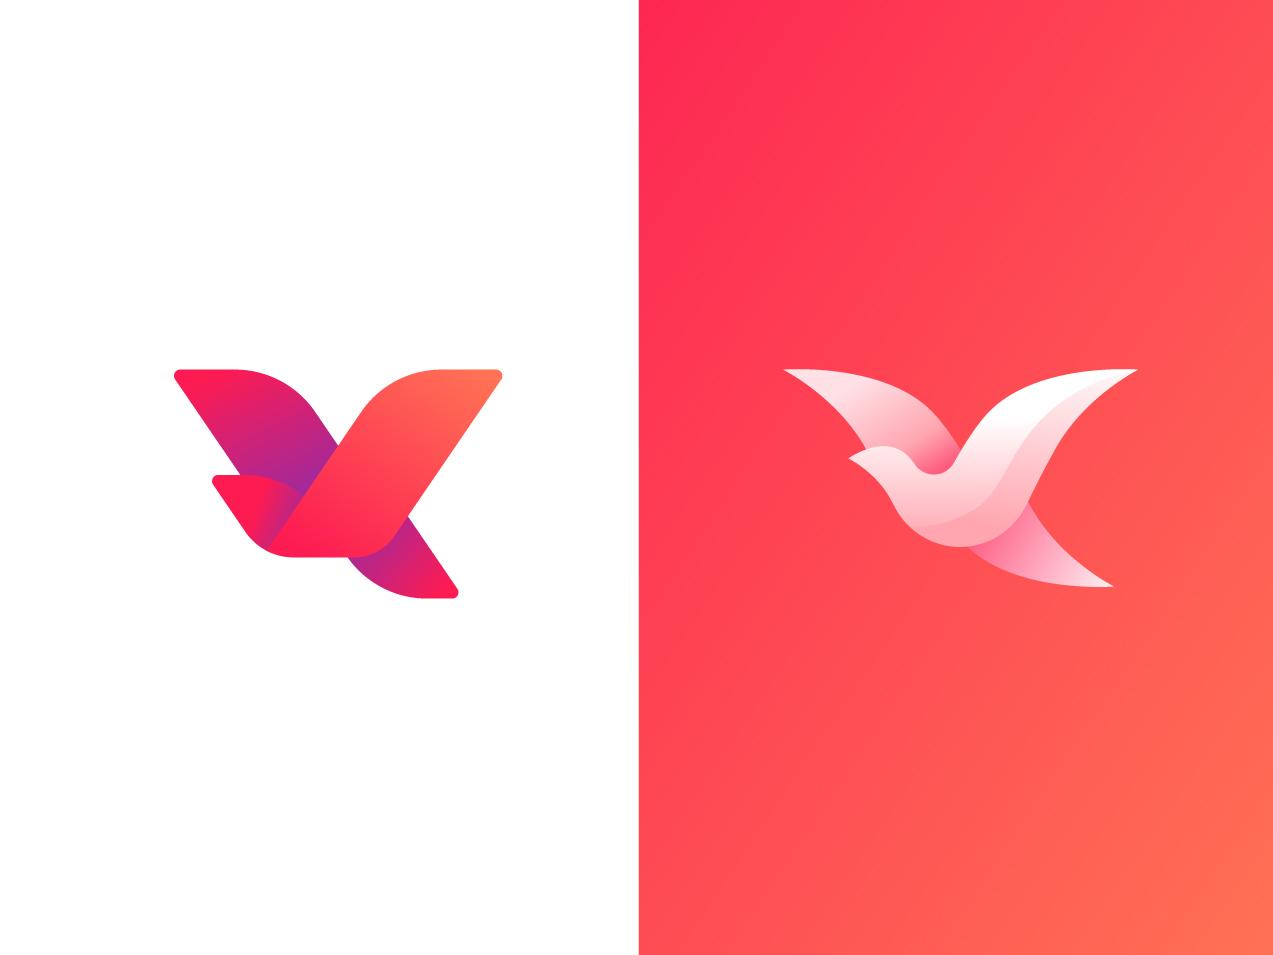 Birds illustration logos vibrant gradient brand mark c v dove bird logo